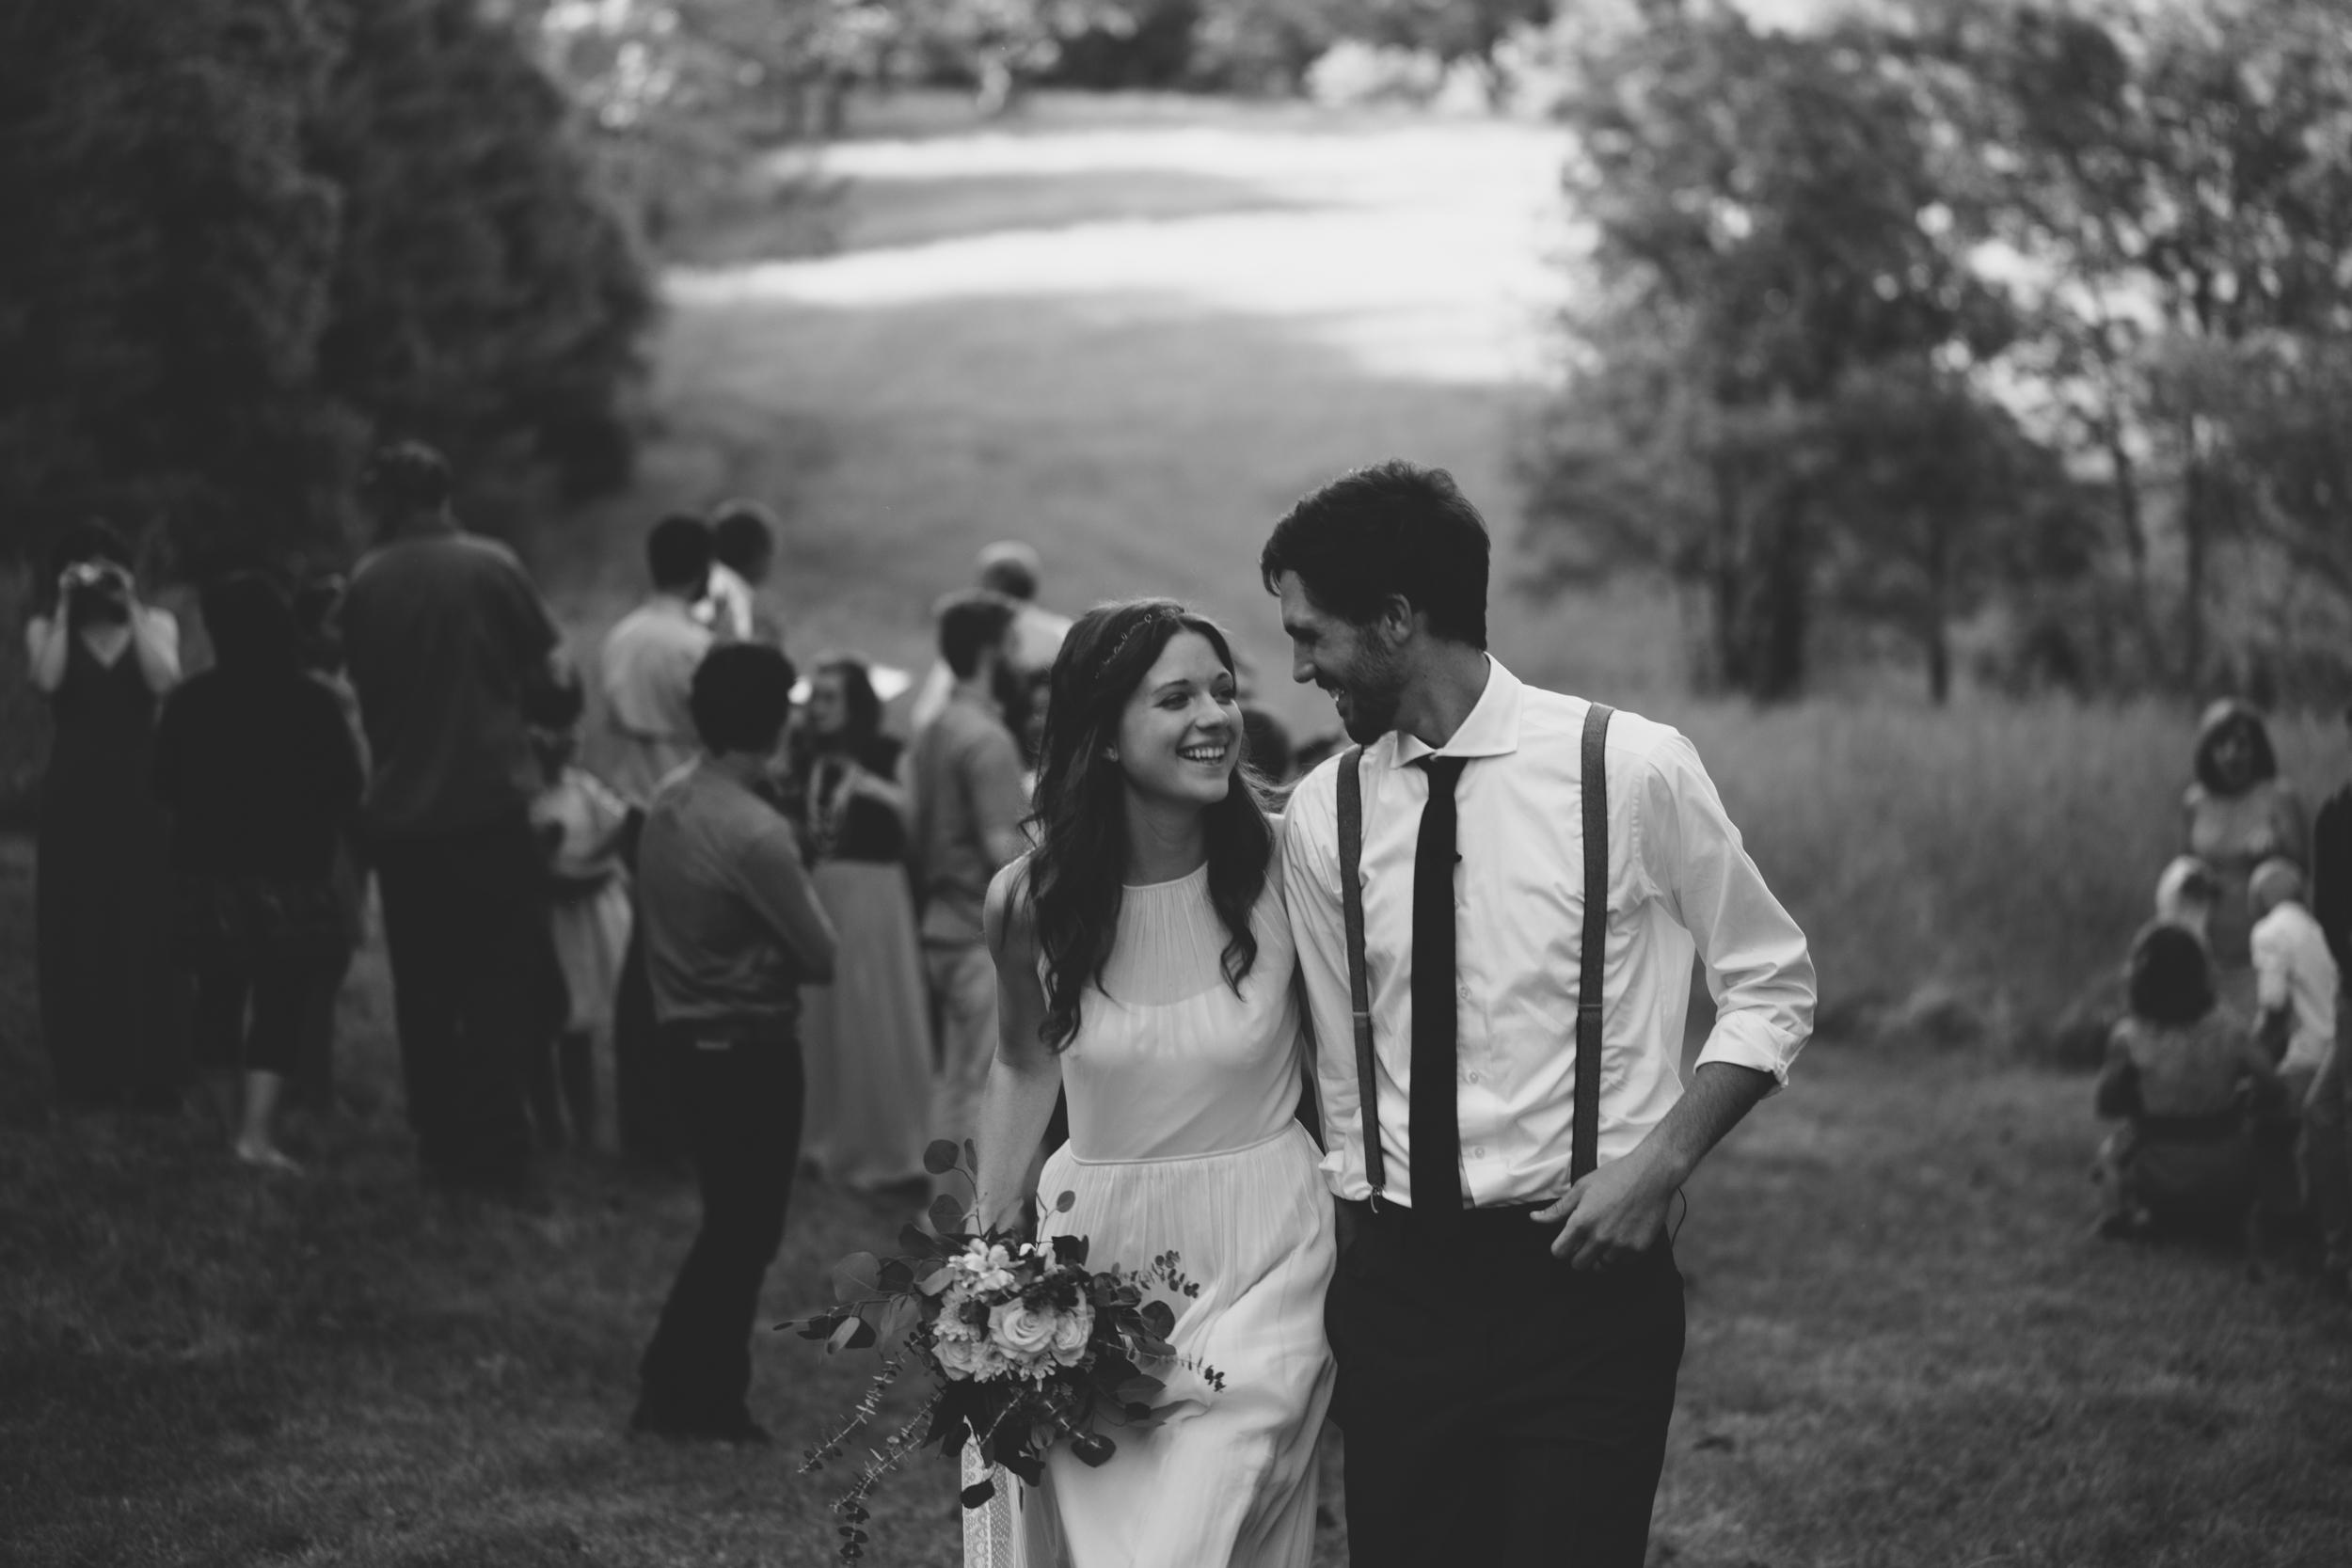 Zack + Hannah Millsaps Wedding in Greenville SC Nashville Wedding Photographer Photography Anthology-76.jpg